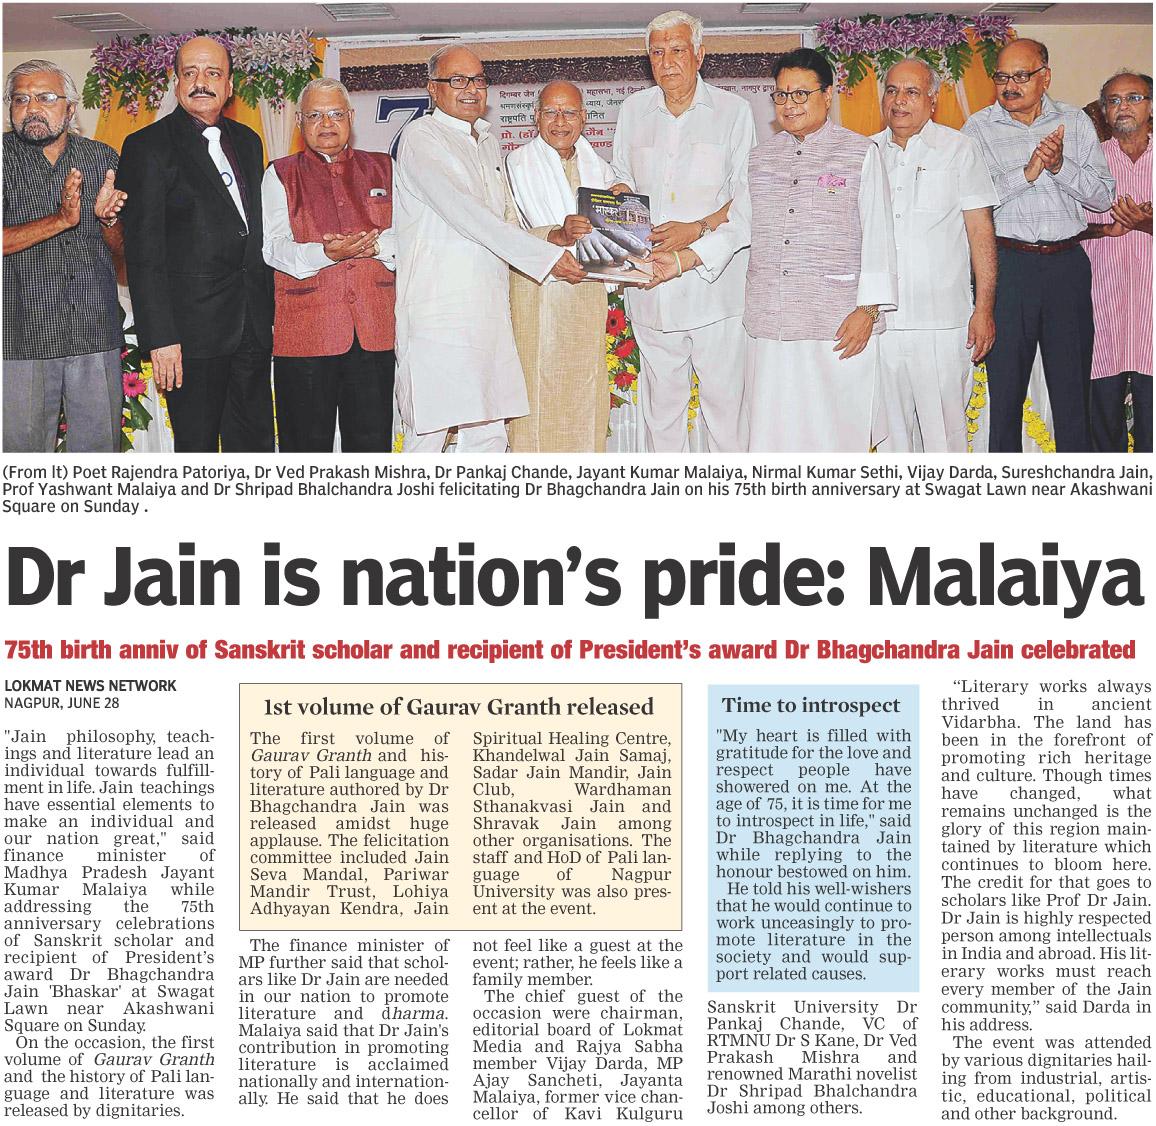 Dr Jain is nation's pride: Malaiya